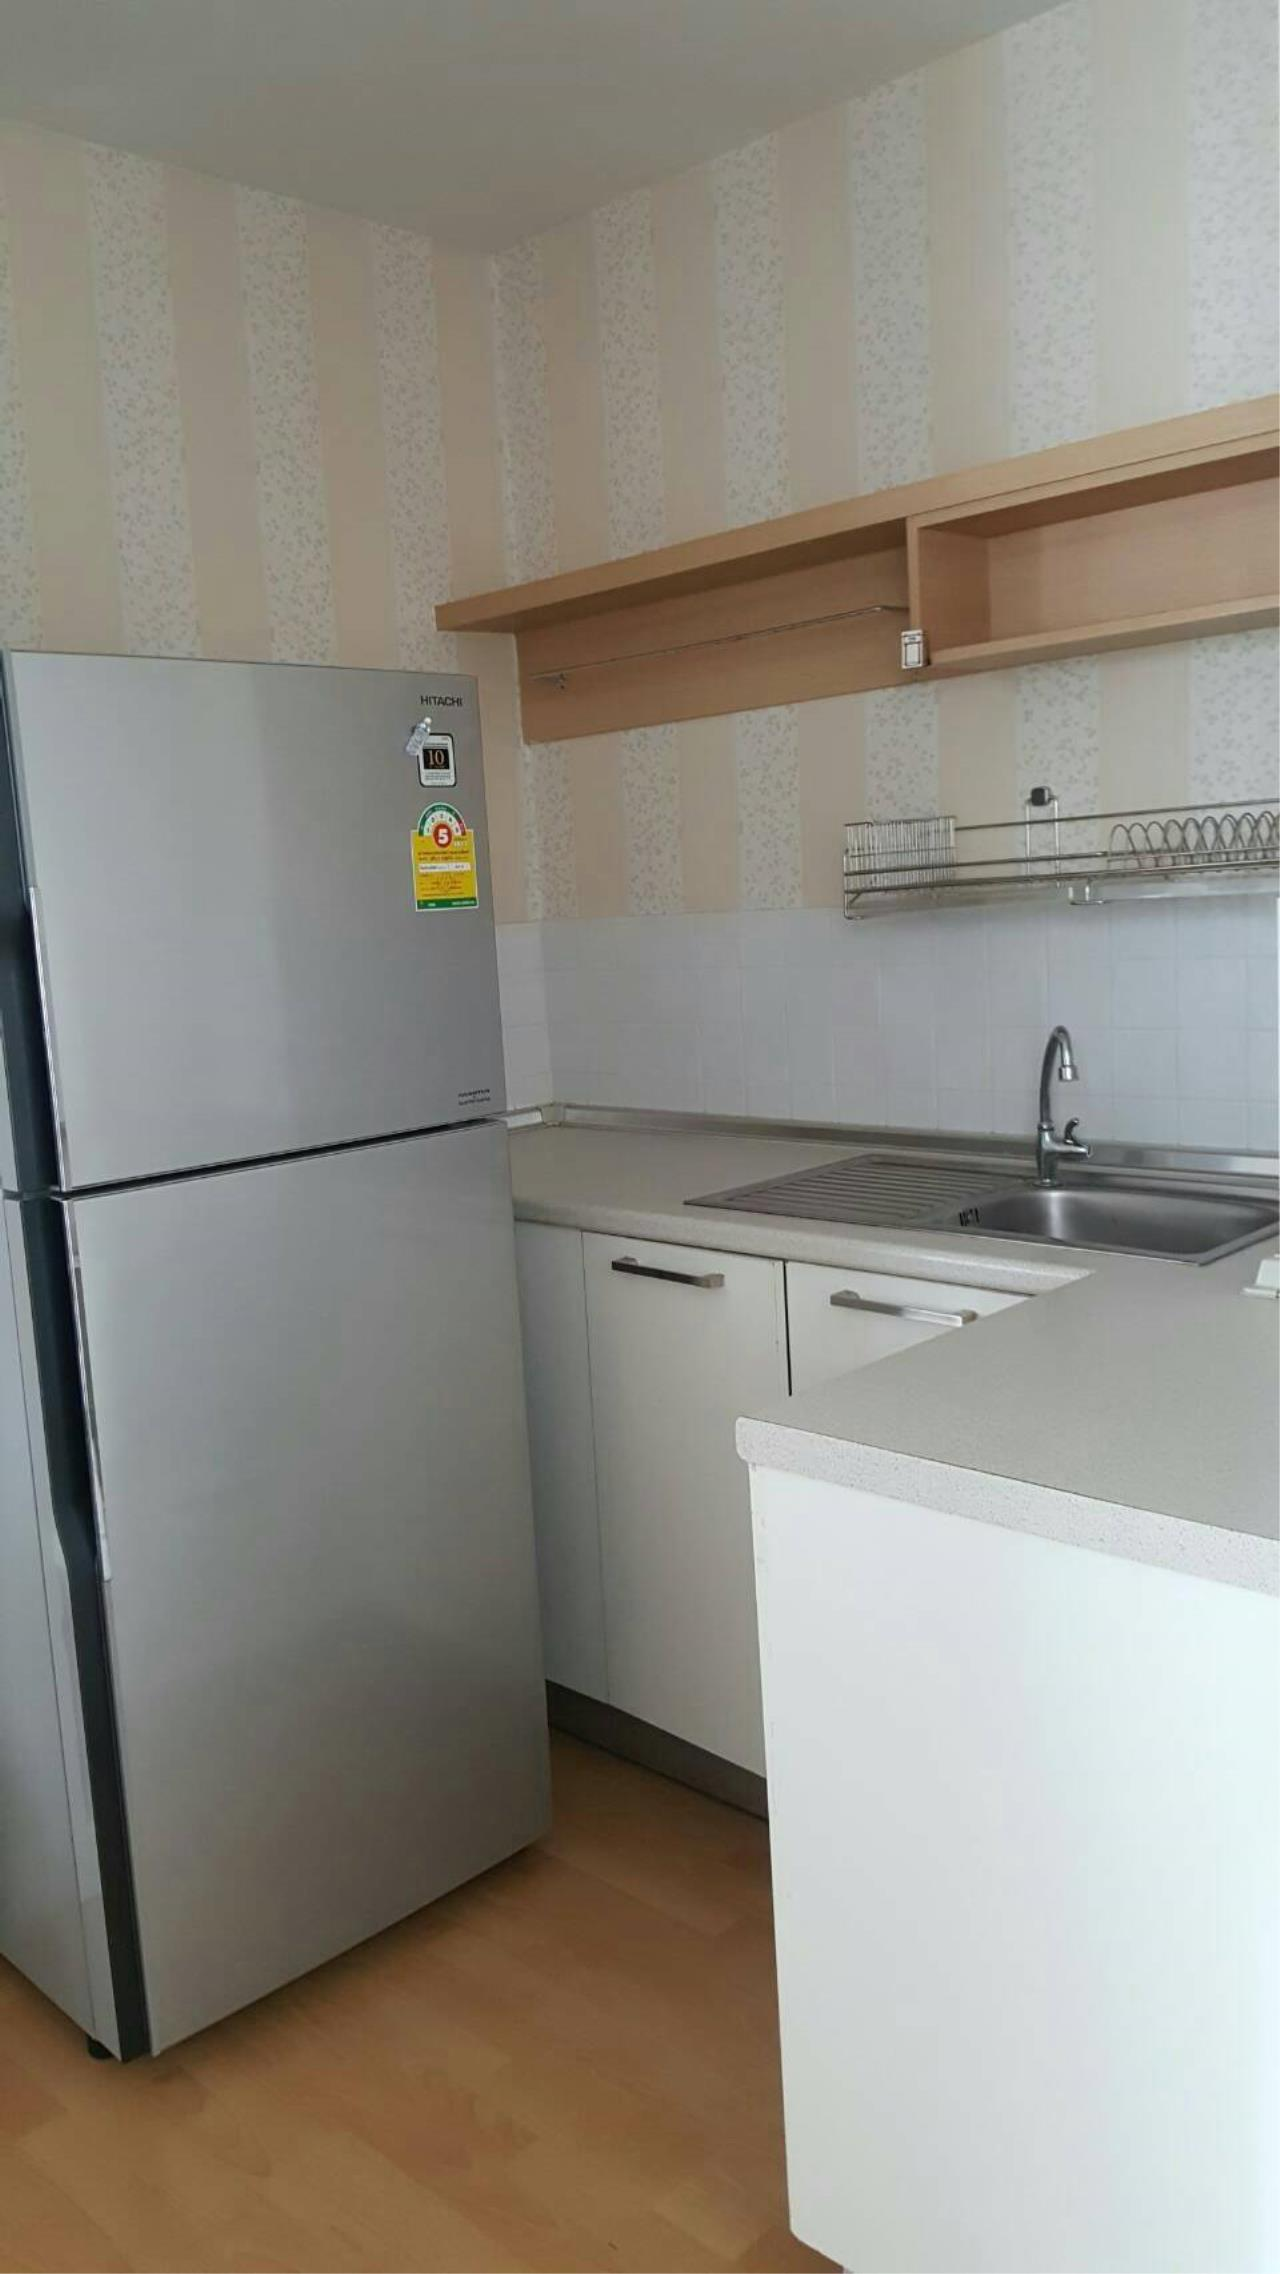 Quality Life Property Agency's R E N T ! My Condo Sukhumvit 52 | Studio 1 BATH | 25 SQ. M. 5